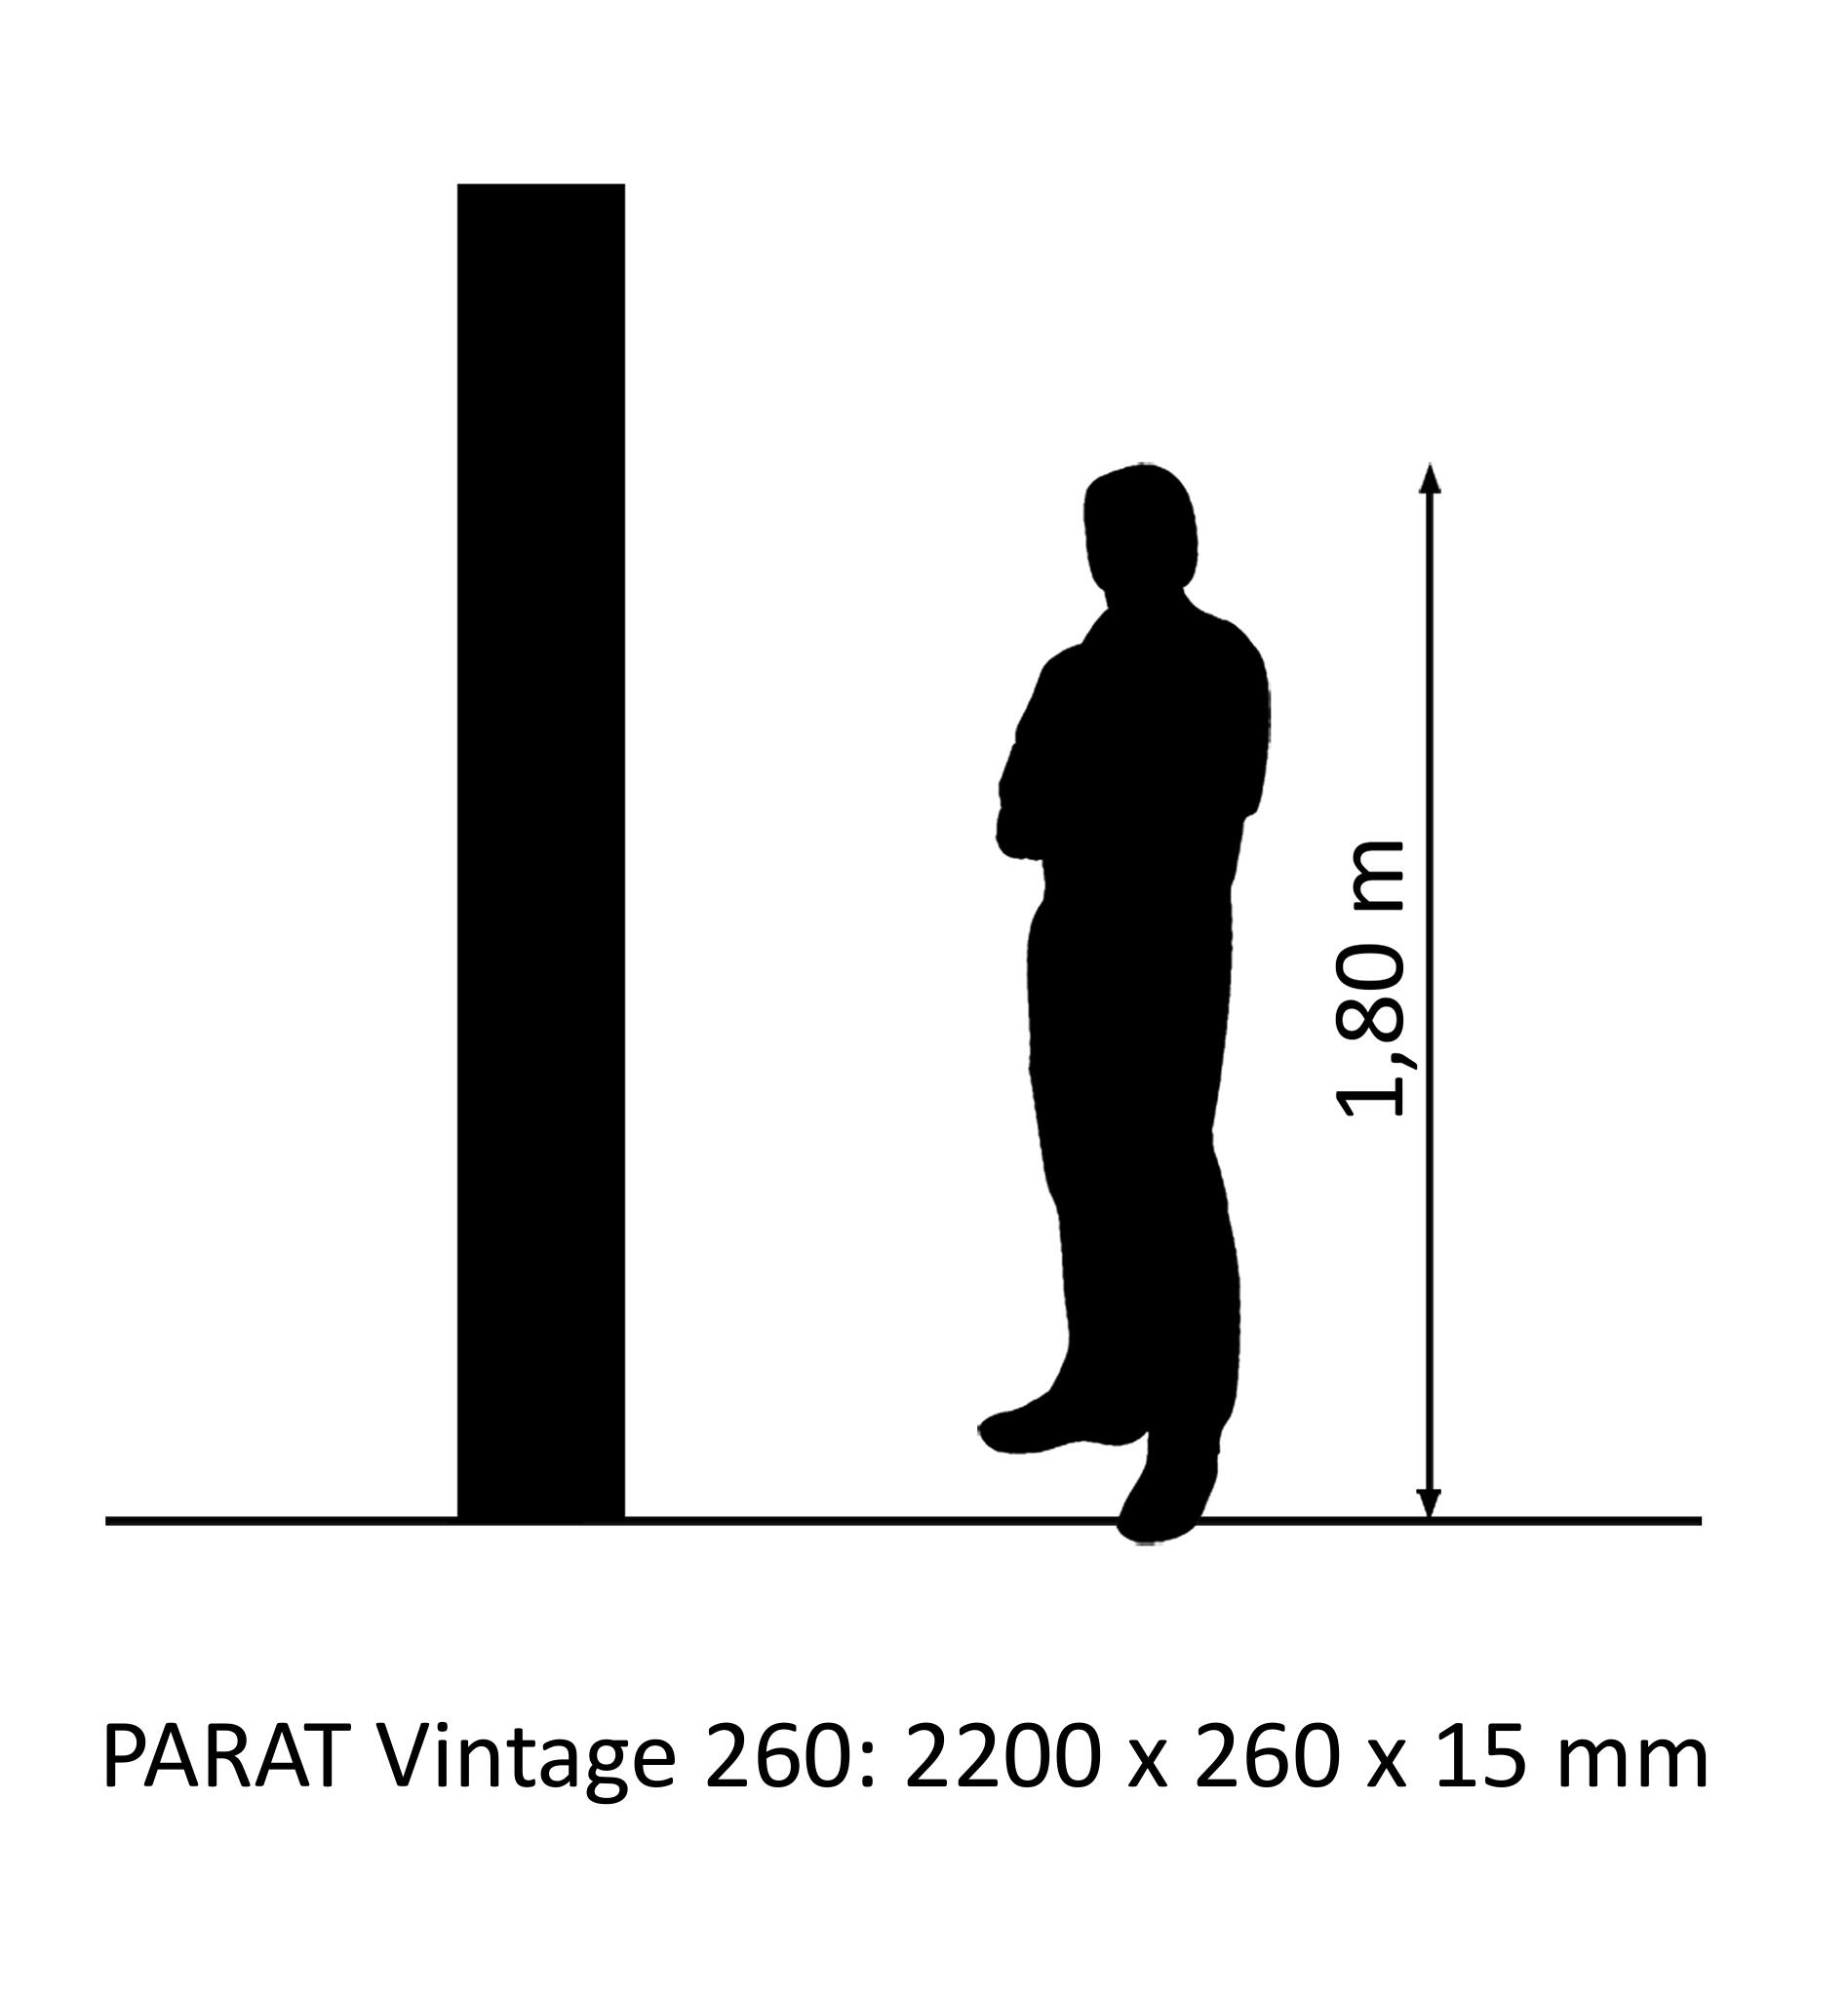 PARAT Vintage 260 Eiche XL Landhausdiele